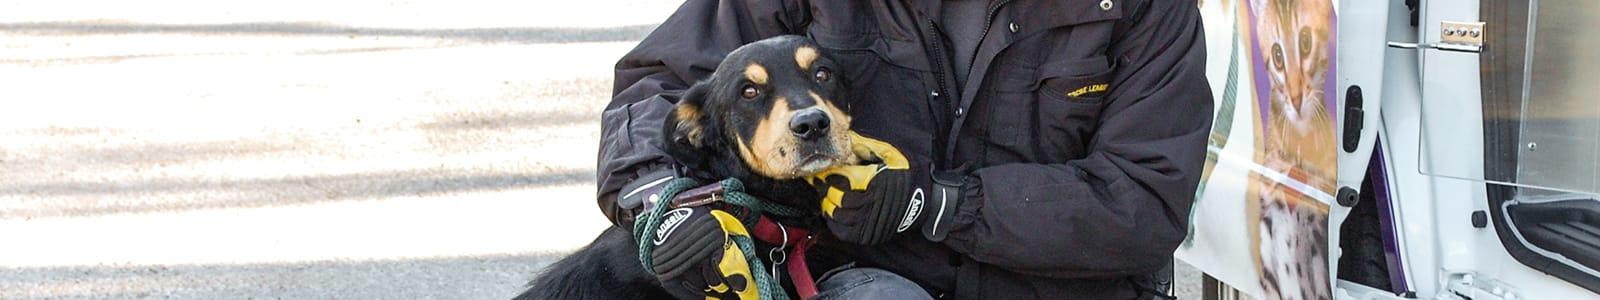 Animal Control | Animal Rescue League of Iowa